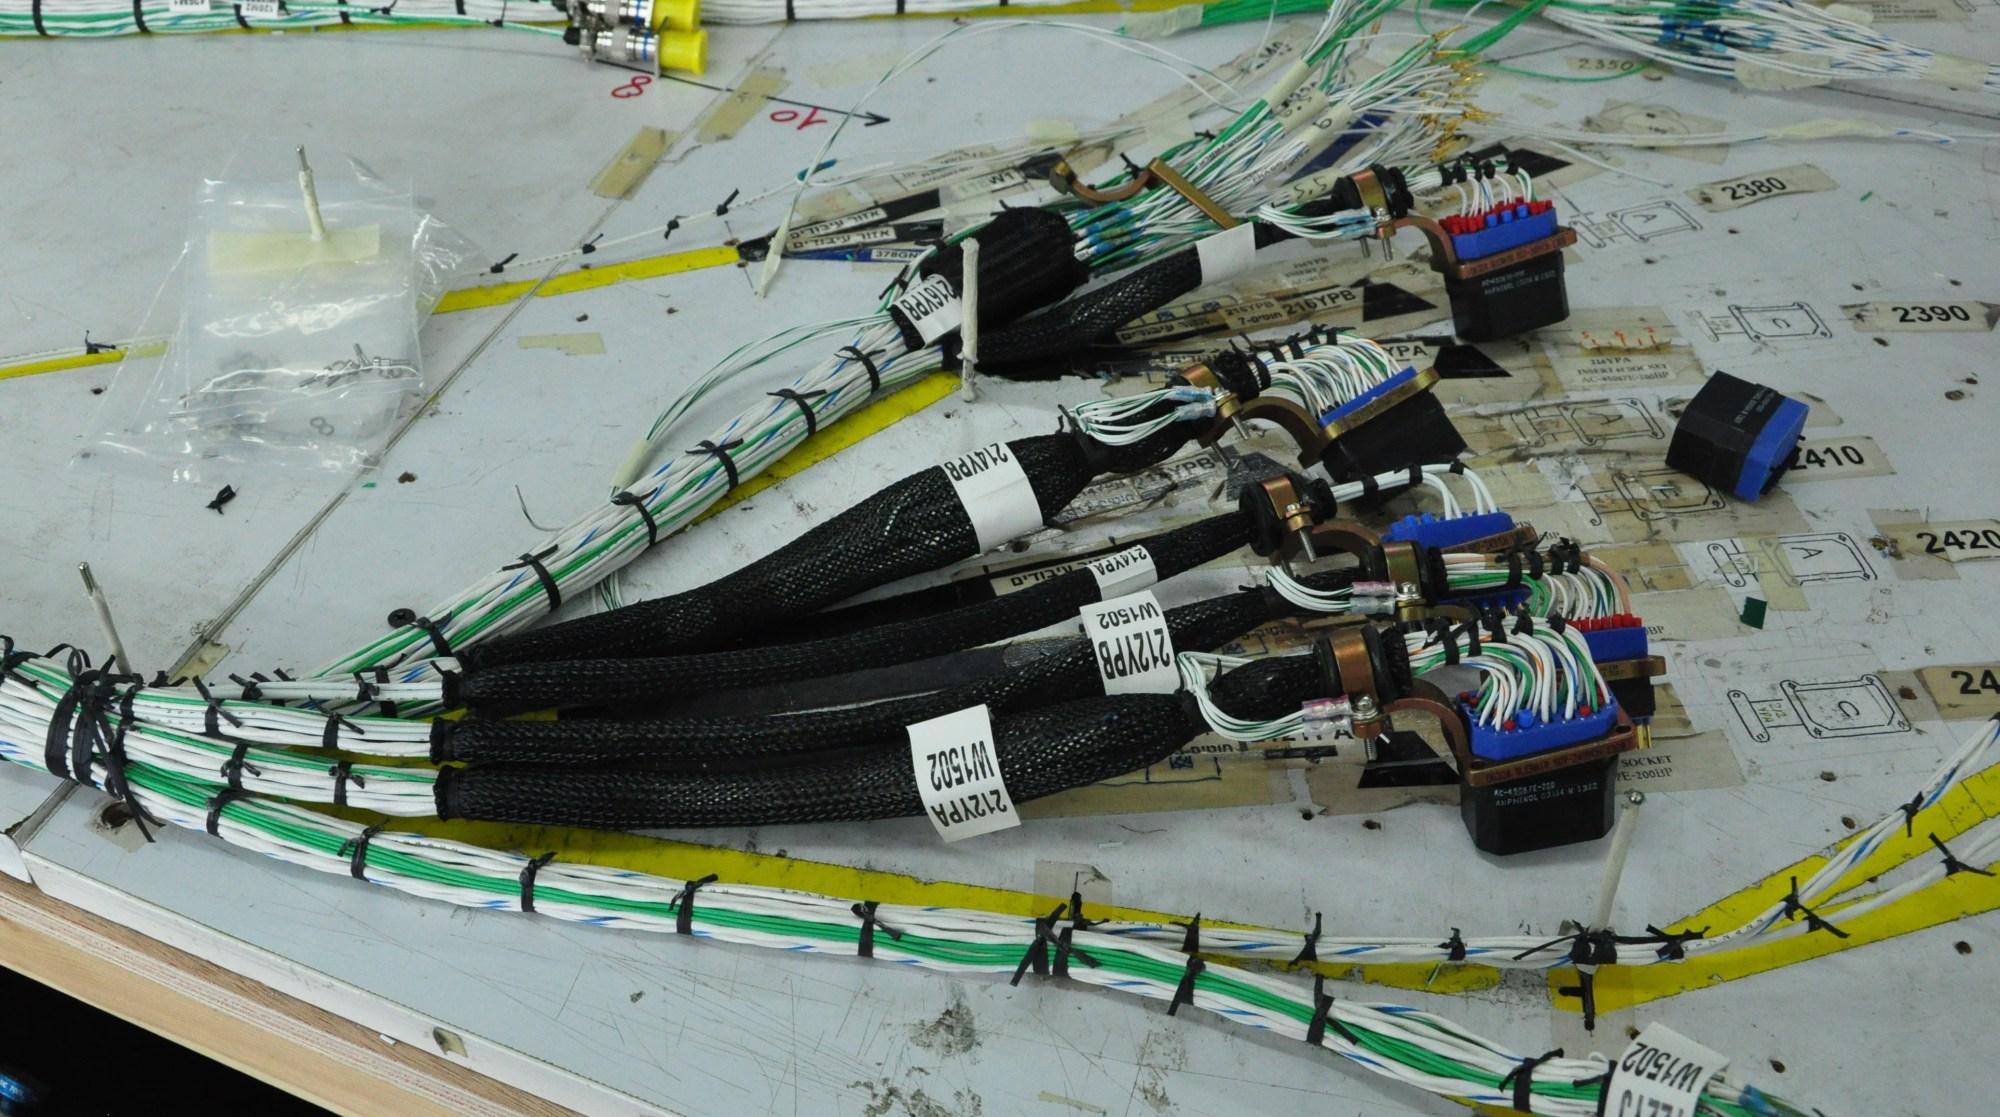 hight resolution of aerospace wiring harness search wiring diagram aerospace wire harness wiring diagram show aerospace wiring harness aerospace